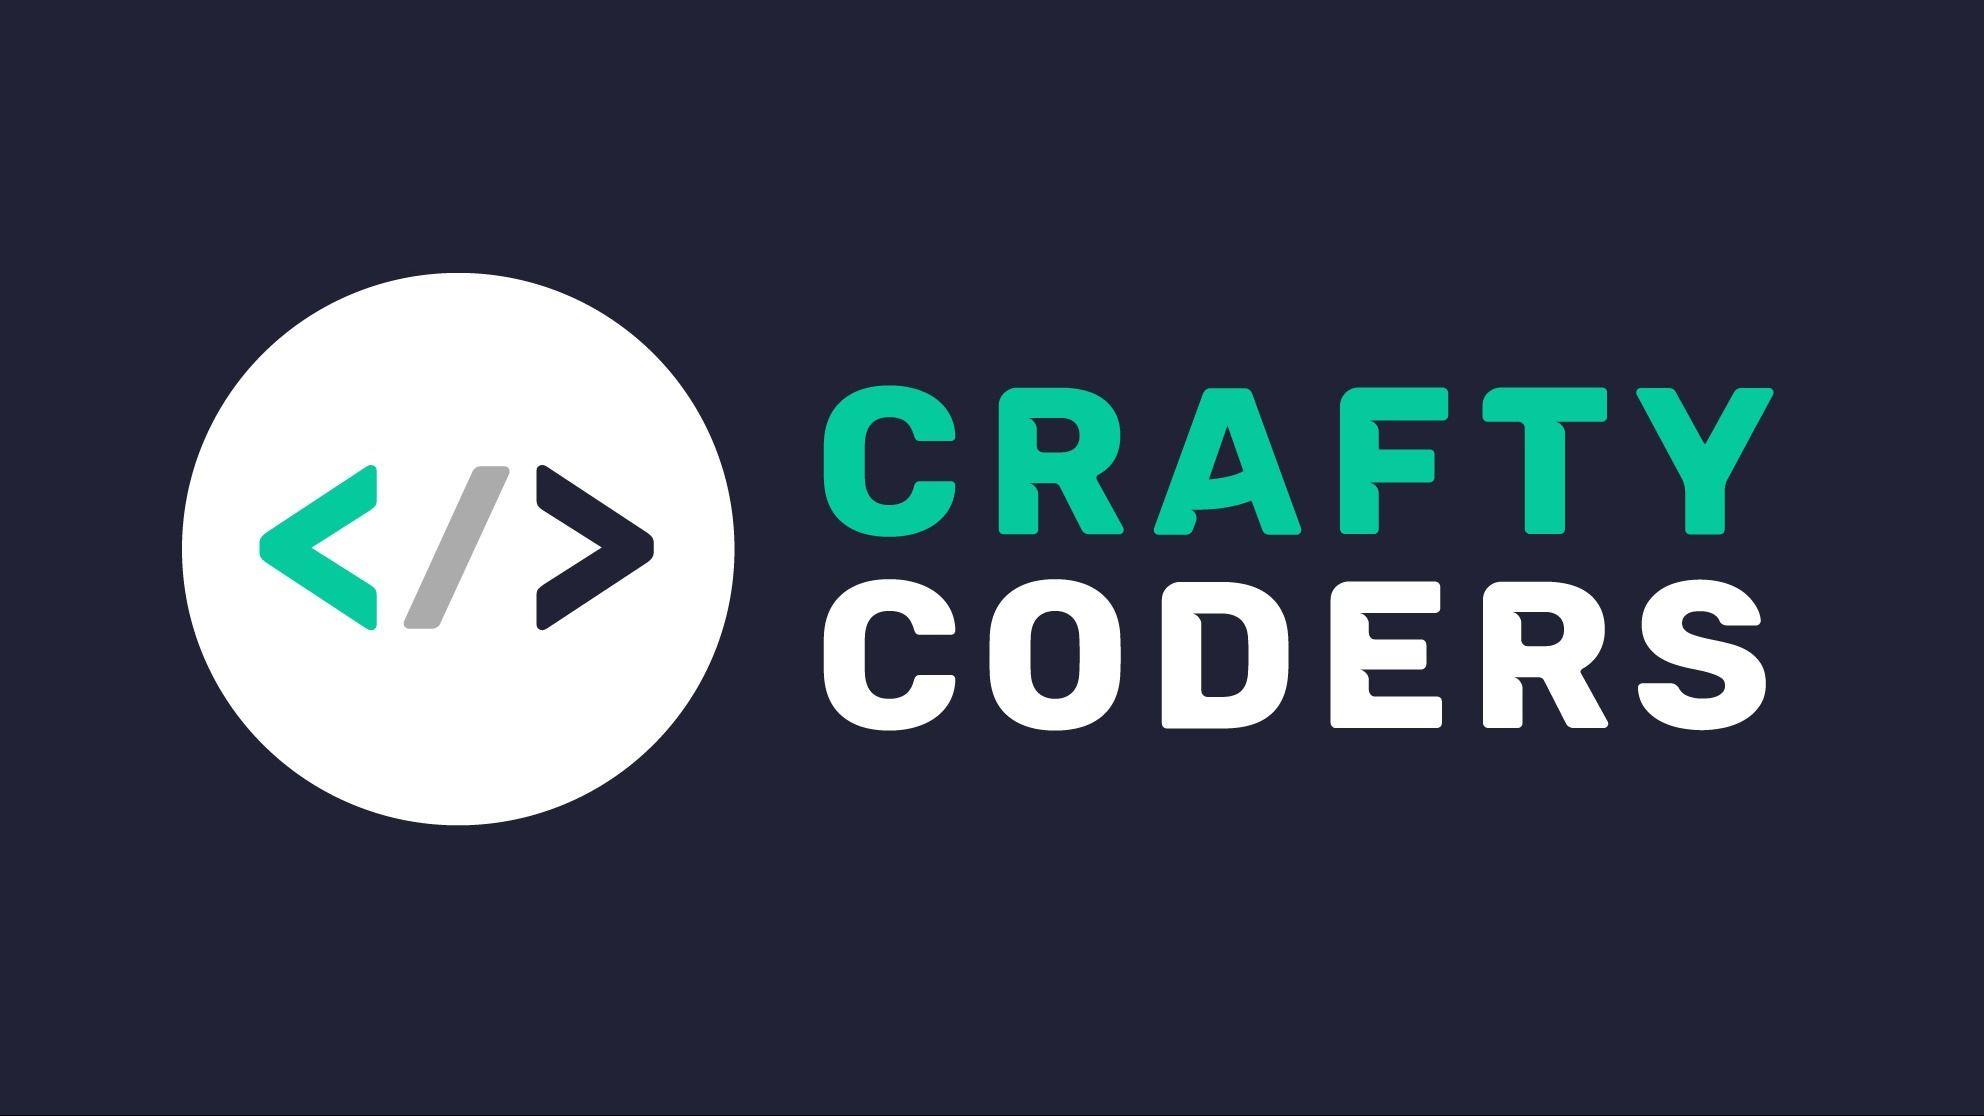 CraftyCoders